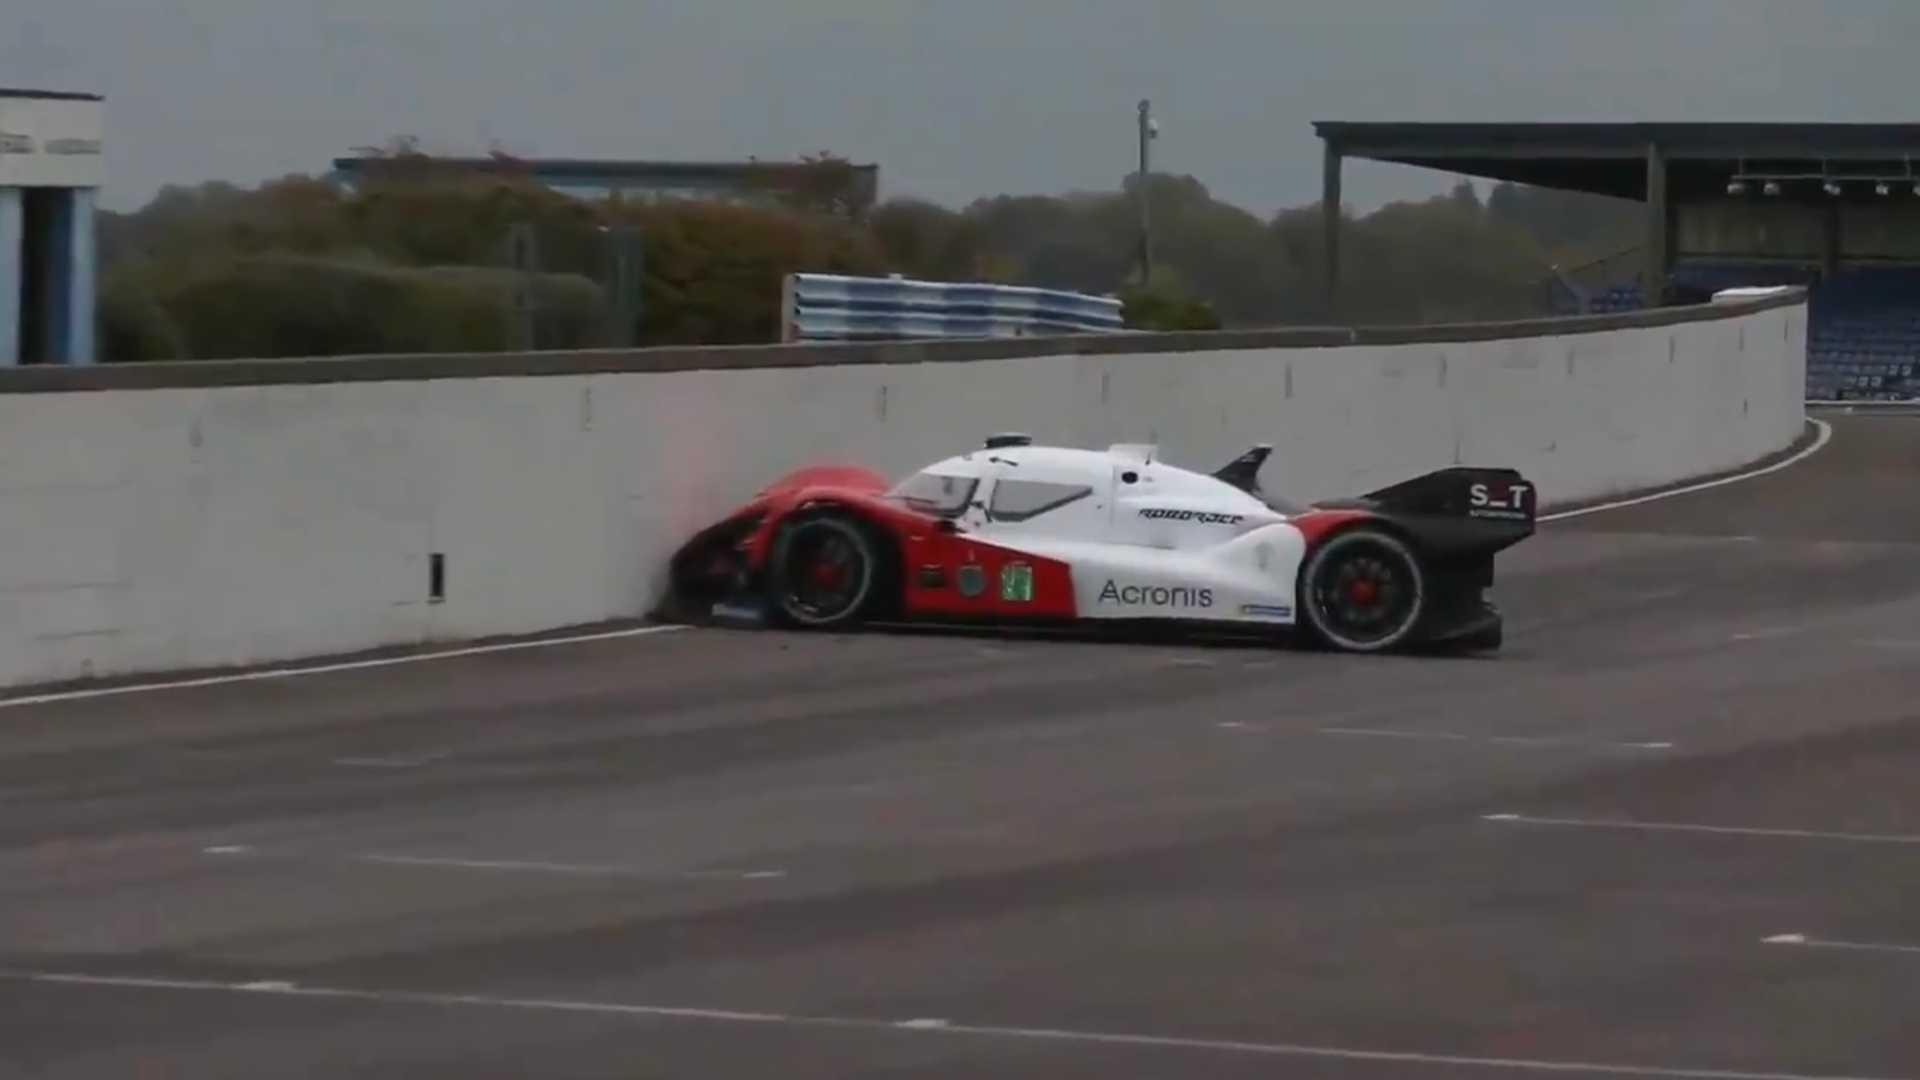 https://cdn.motor1.com/images/mgl/VkNeB/s1/autonomous-race-car-crash.jpg